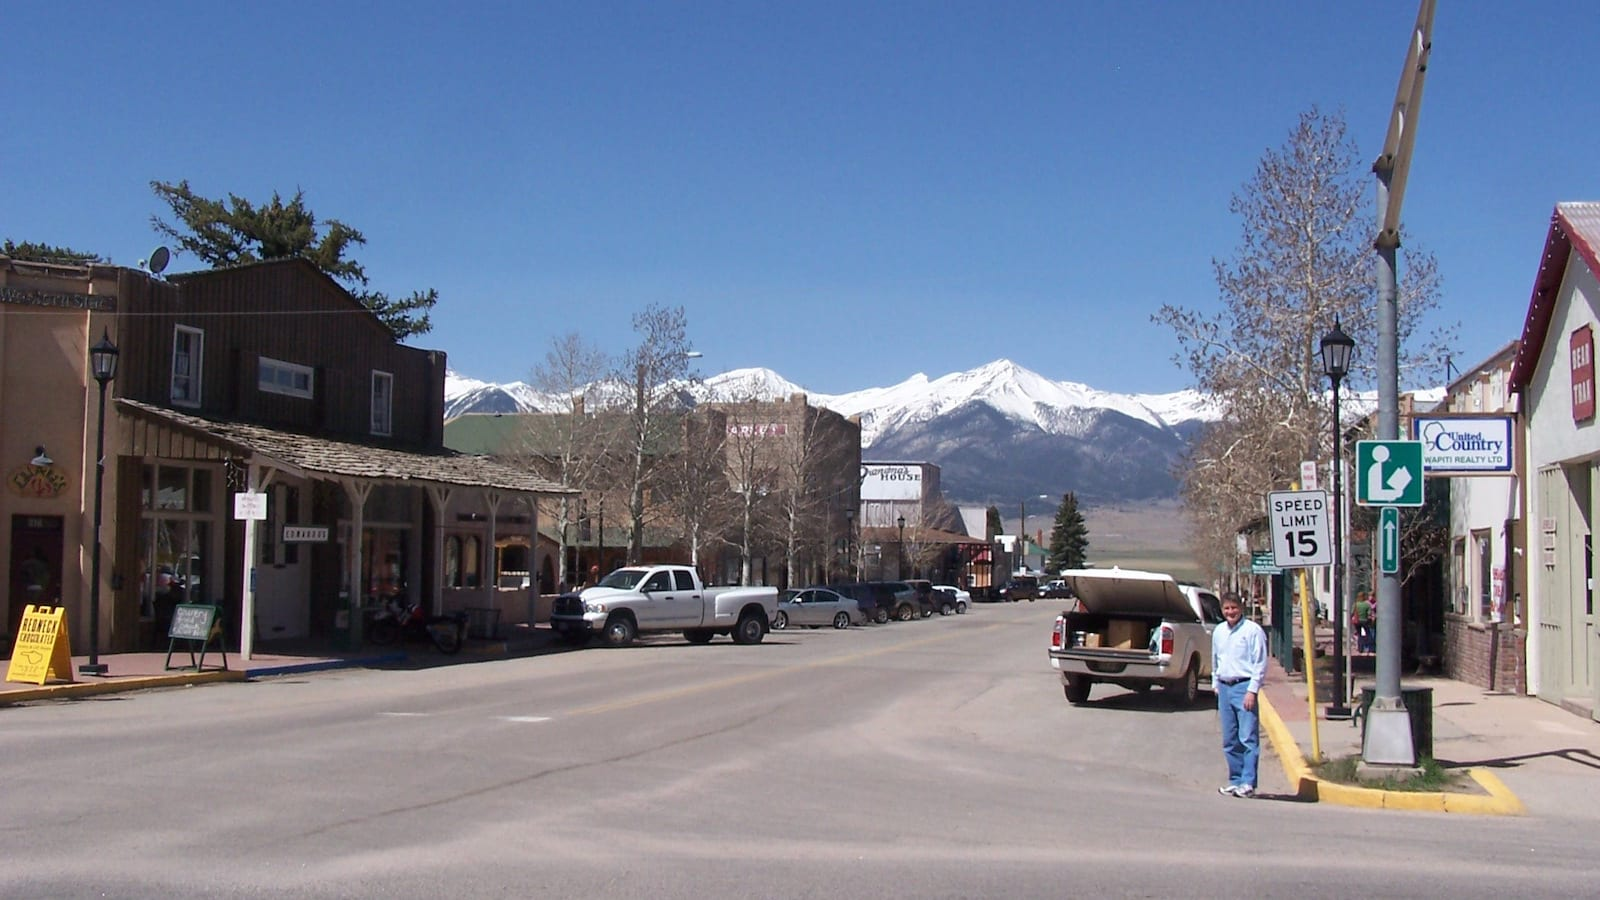 Downtown Westcliffe CO Main Street Sange De Cristo Mountains